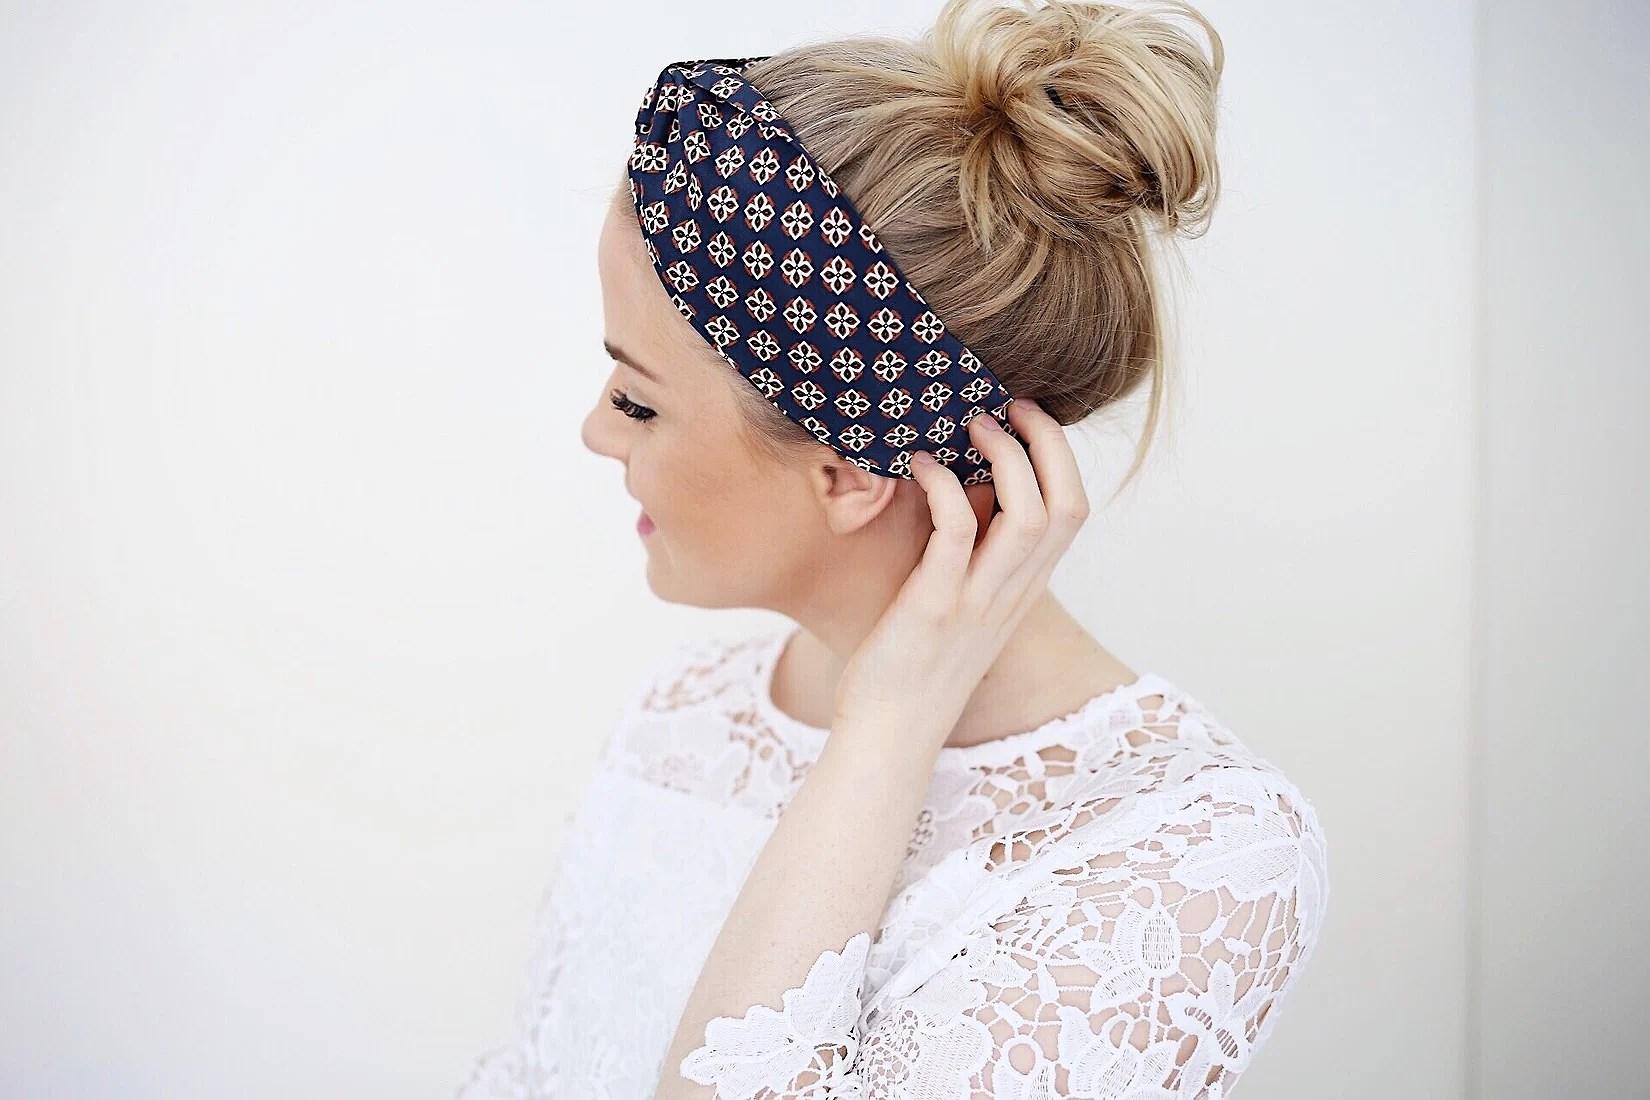 The cutest headband